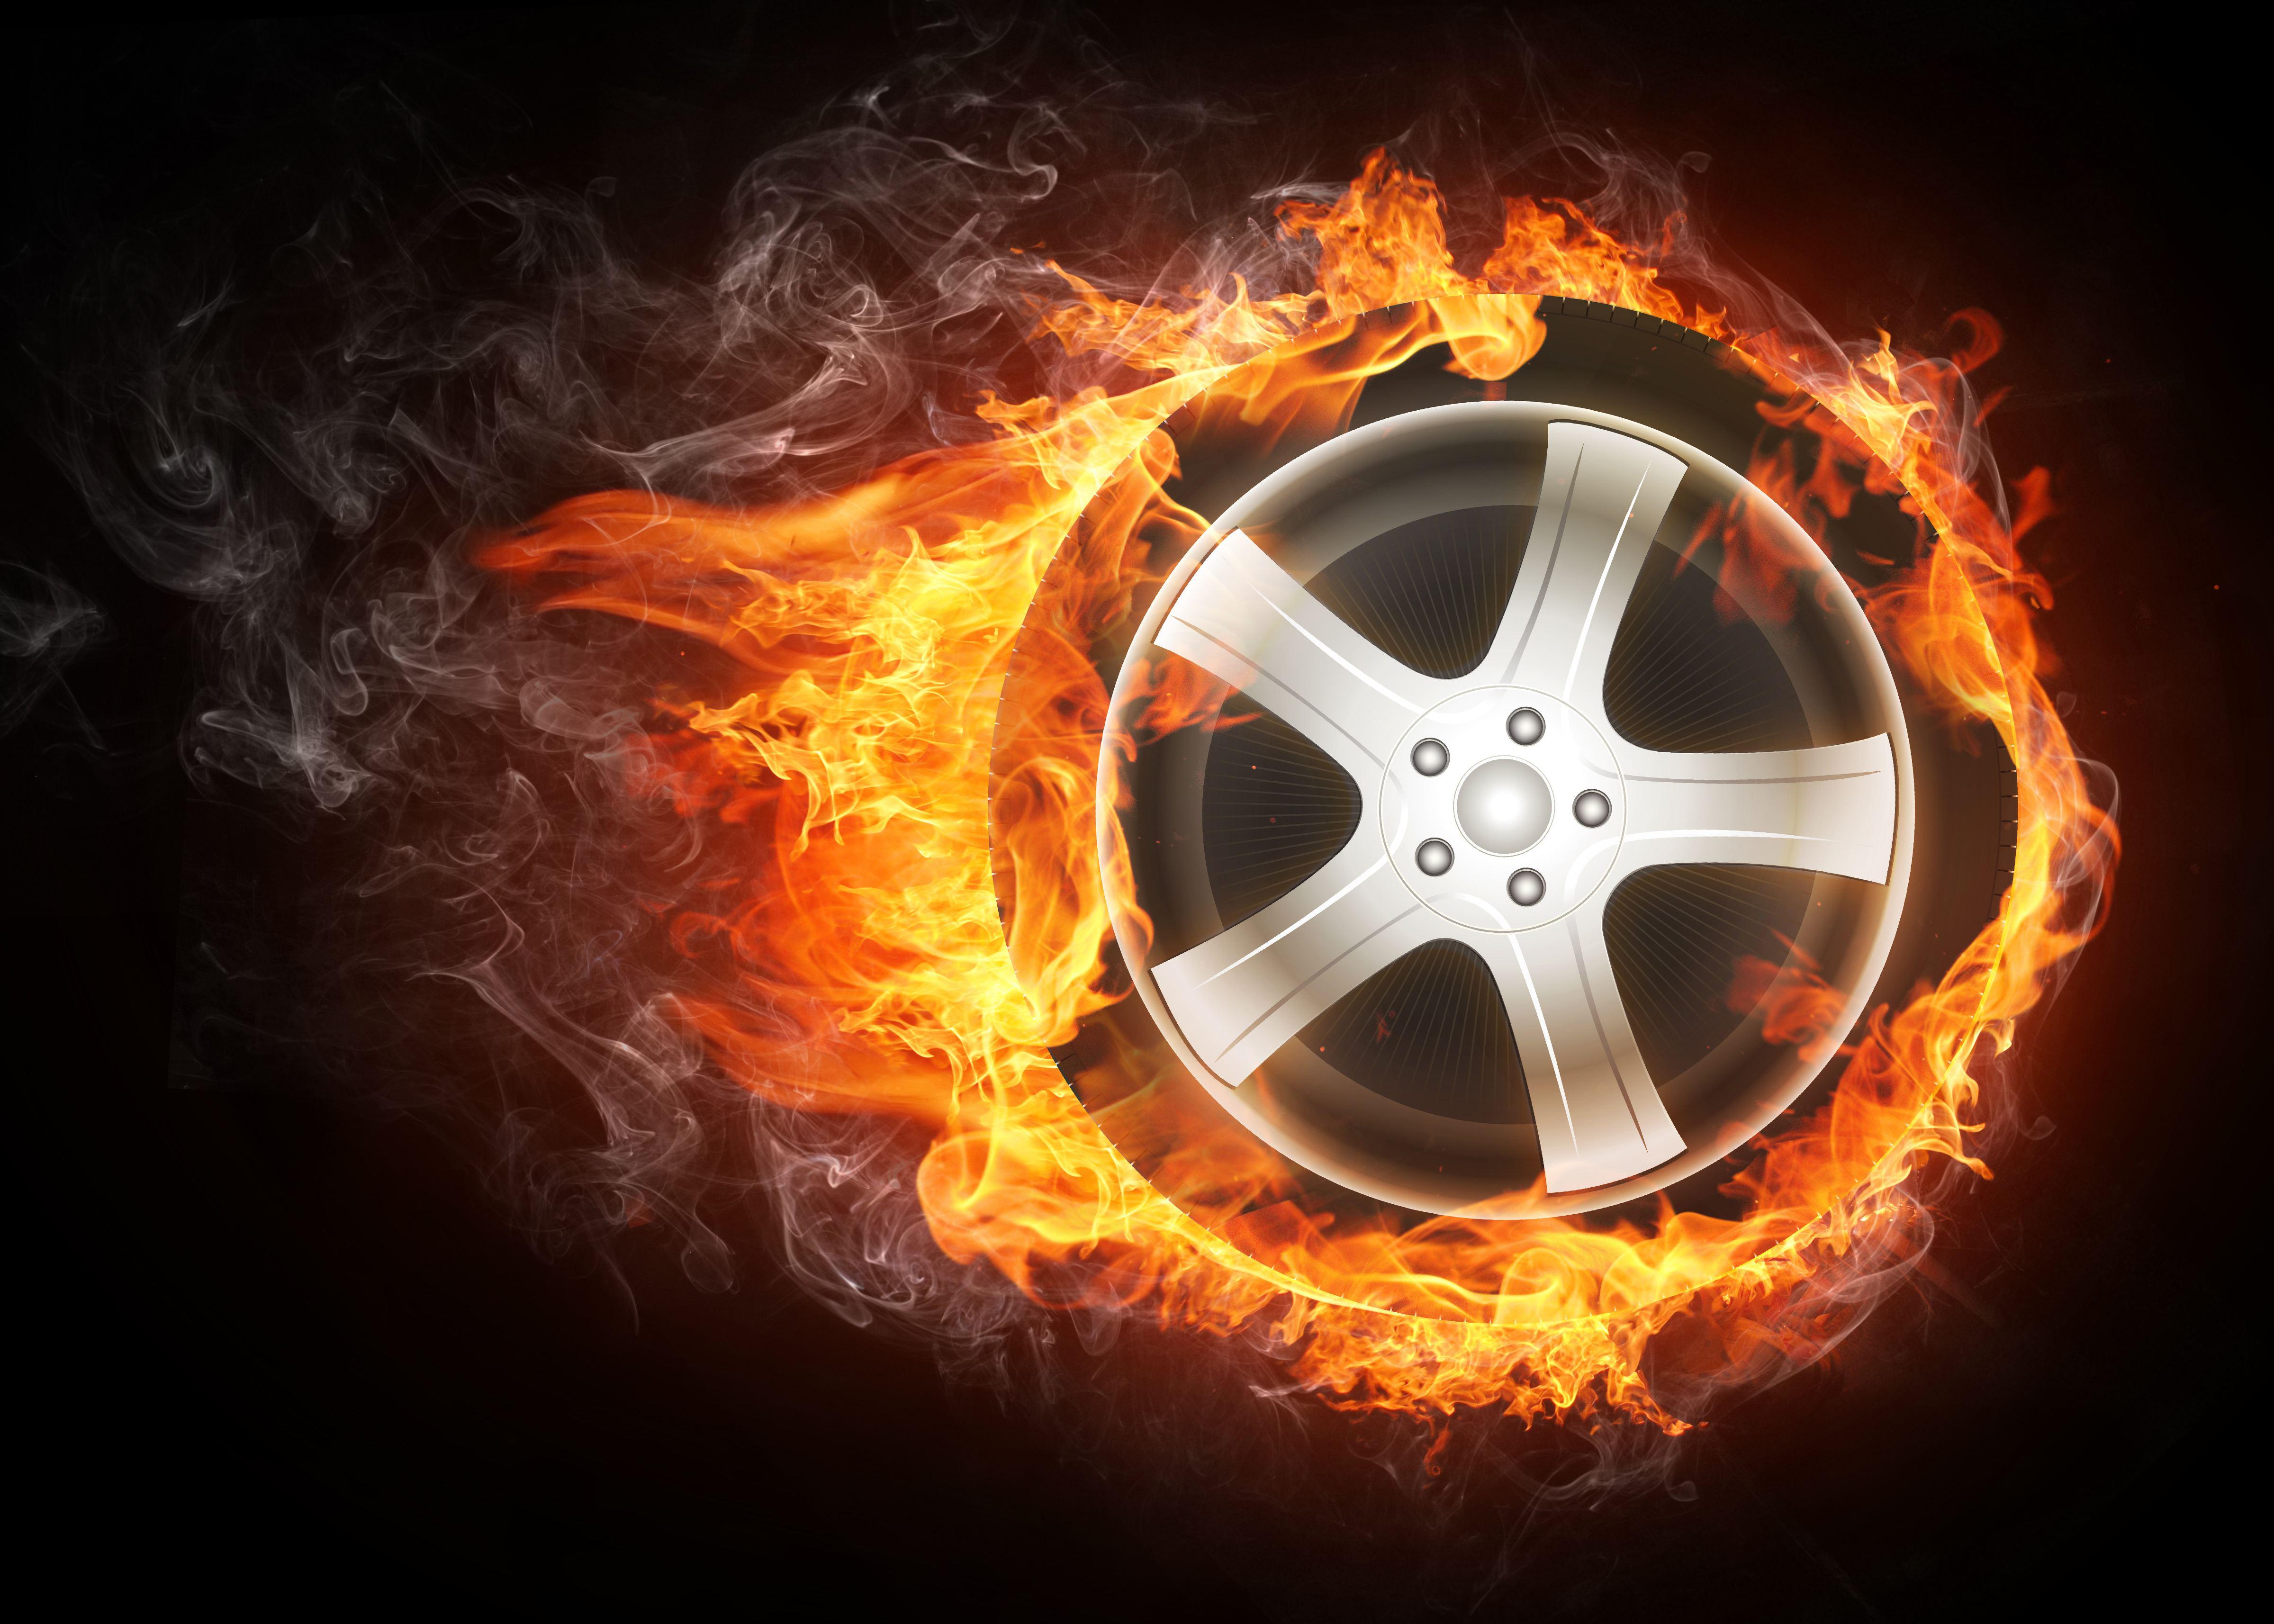 Gazans to burn thousands of tires at border - Israel News ... |Flamming Tire